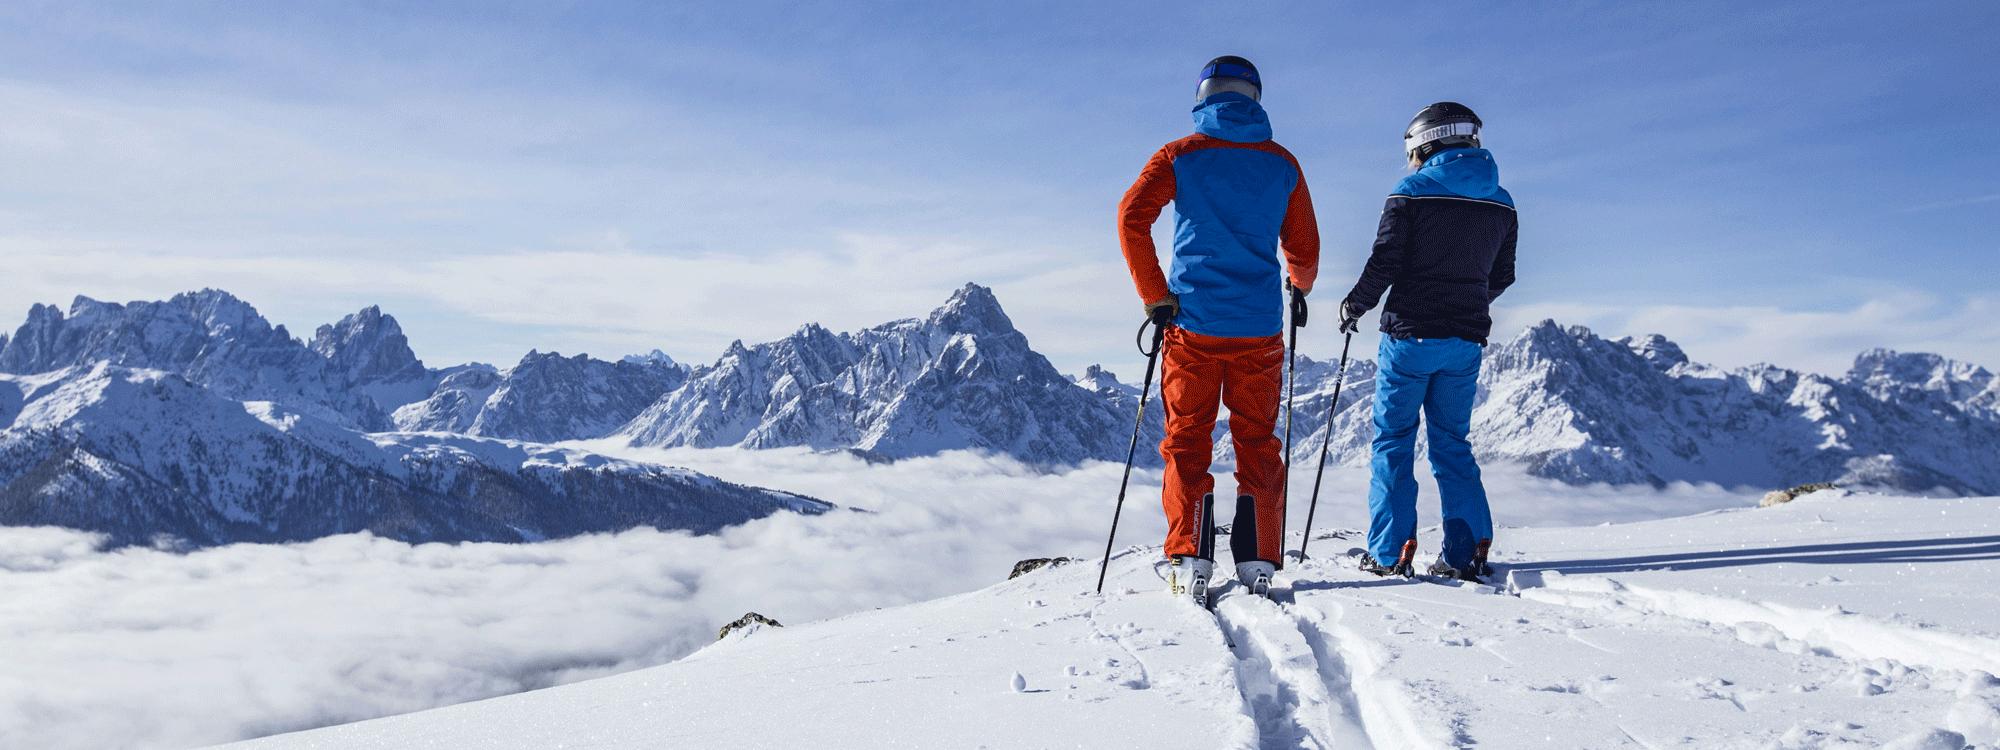 skifahren_sillian3